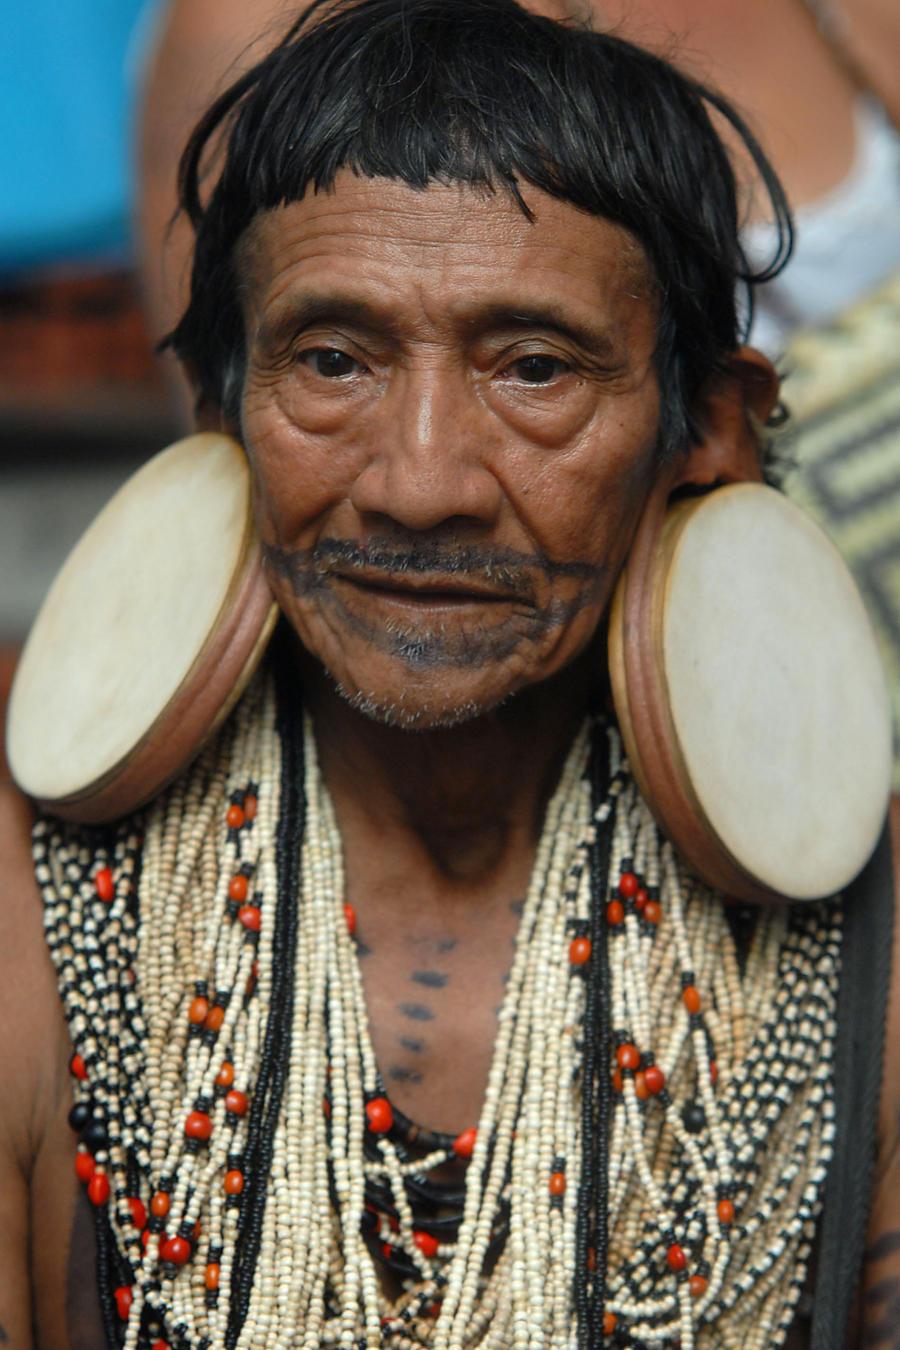 indio hindu single men Explore plus size fashion online in india choose from xl, xxl, xxxl, xxxxl, plus size clothes, dresses at jabongcom fast shipping easy returns cod.